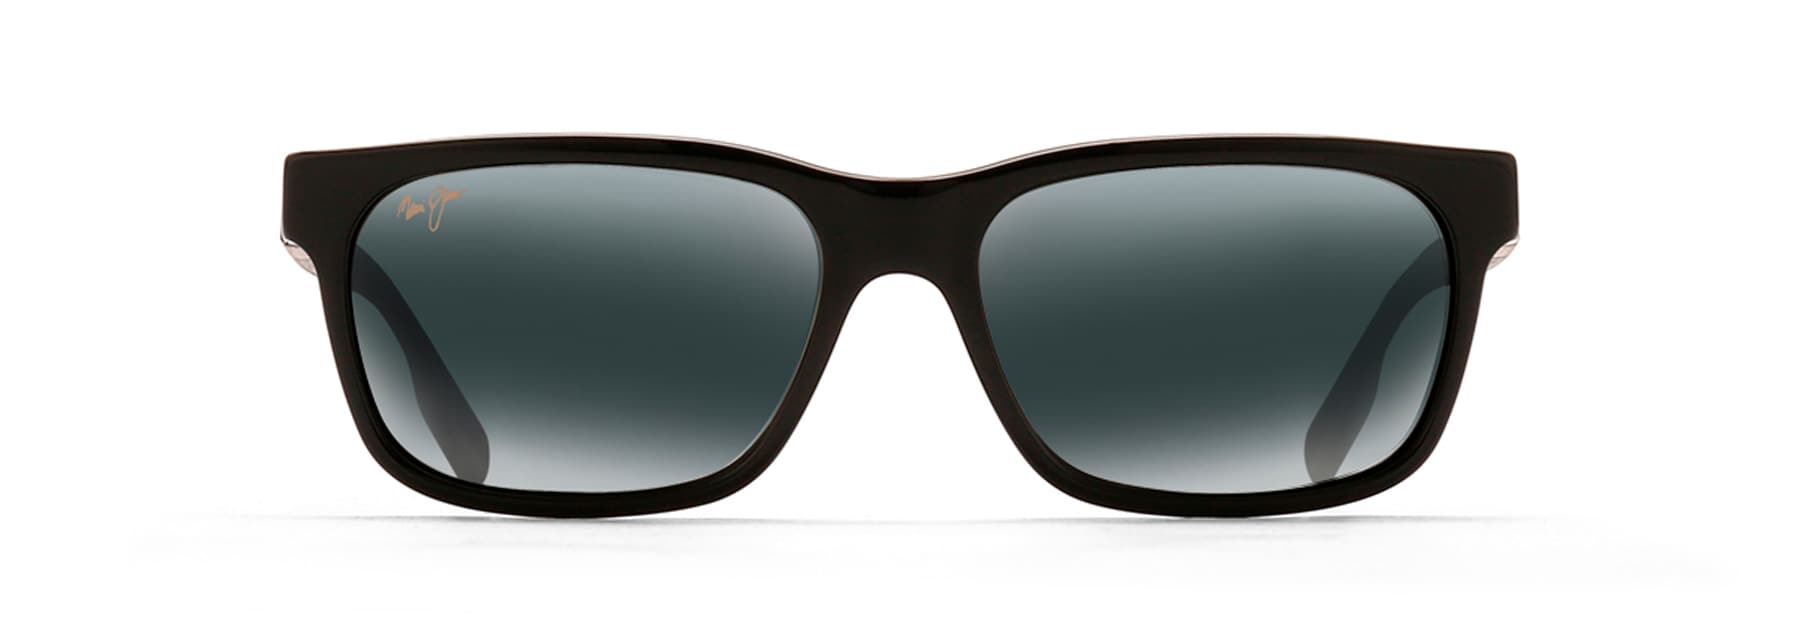 f3fd396debea Eh Brah Polarized Sunglasses | Maui Jim®